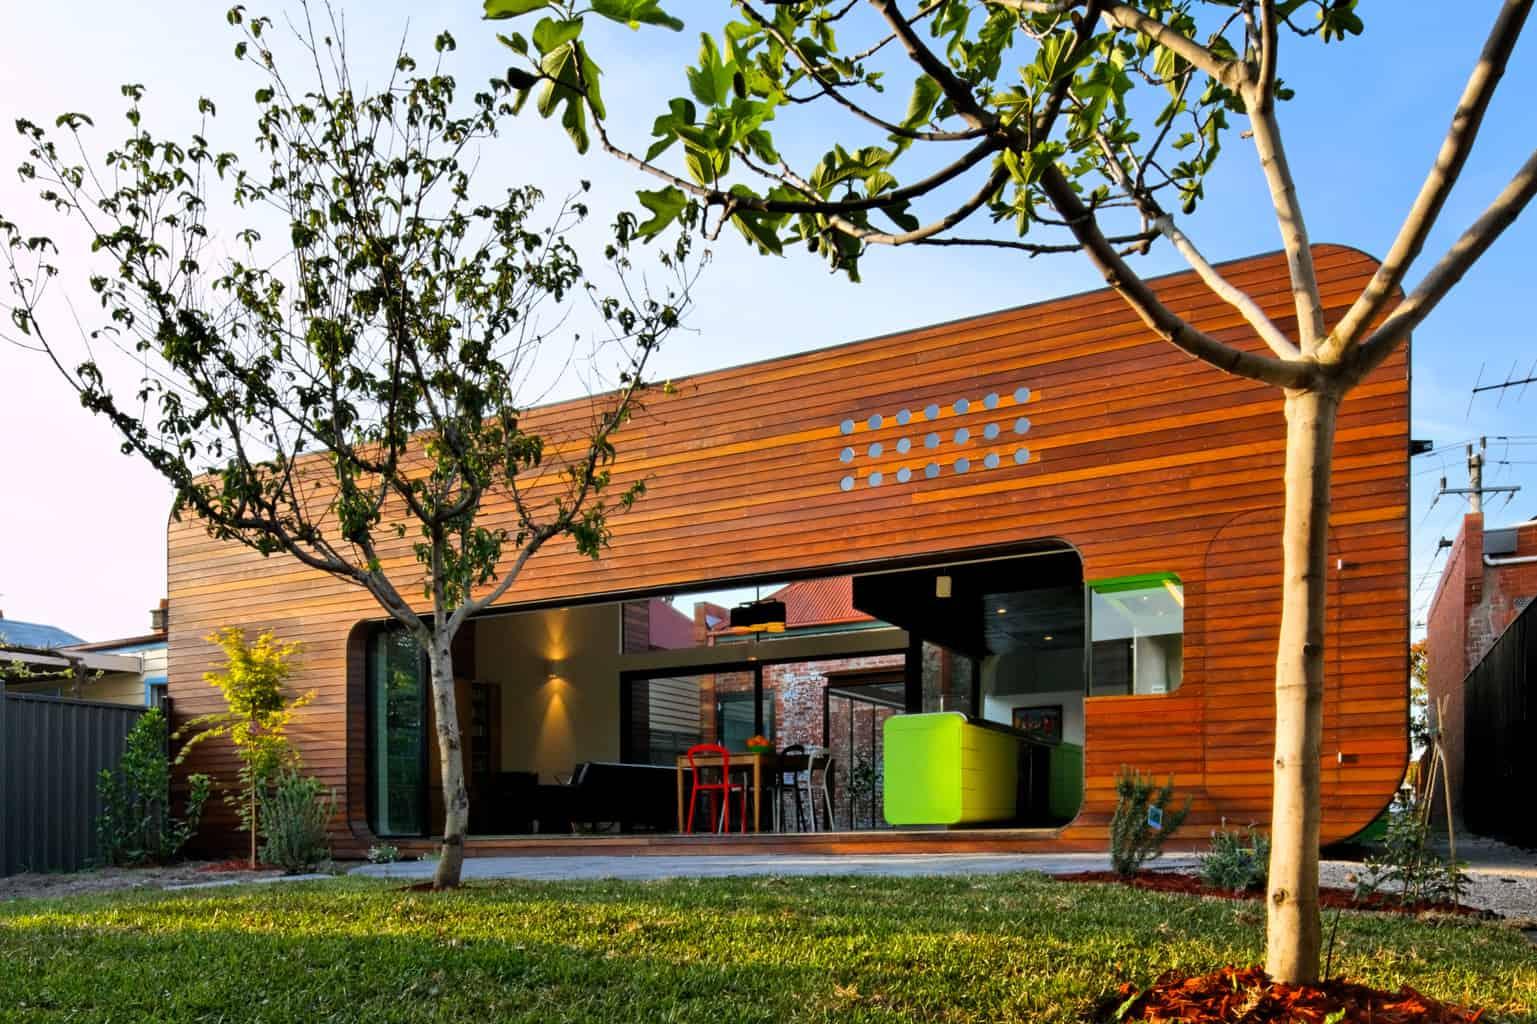 A vibrant modern addition to a Victorian era home